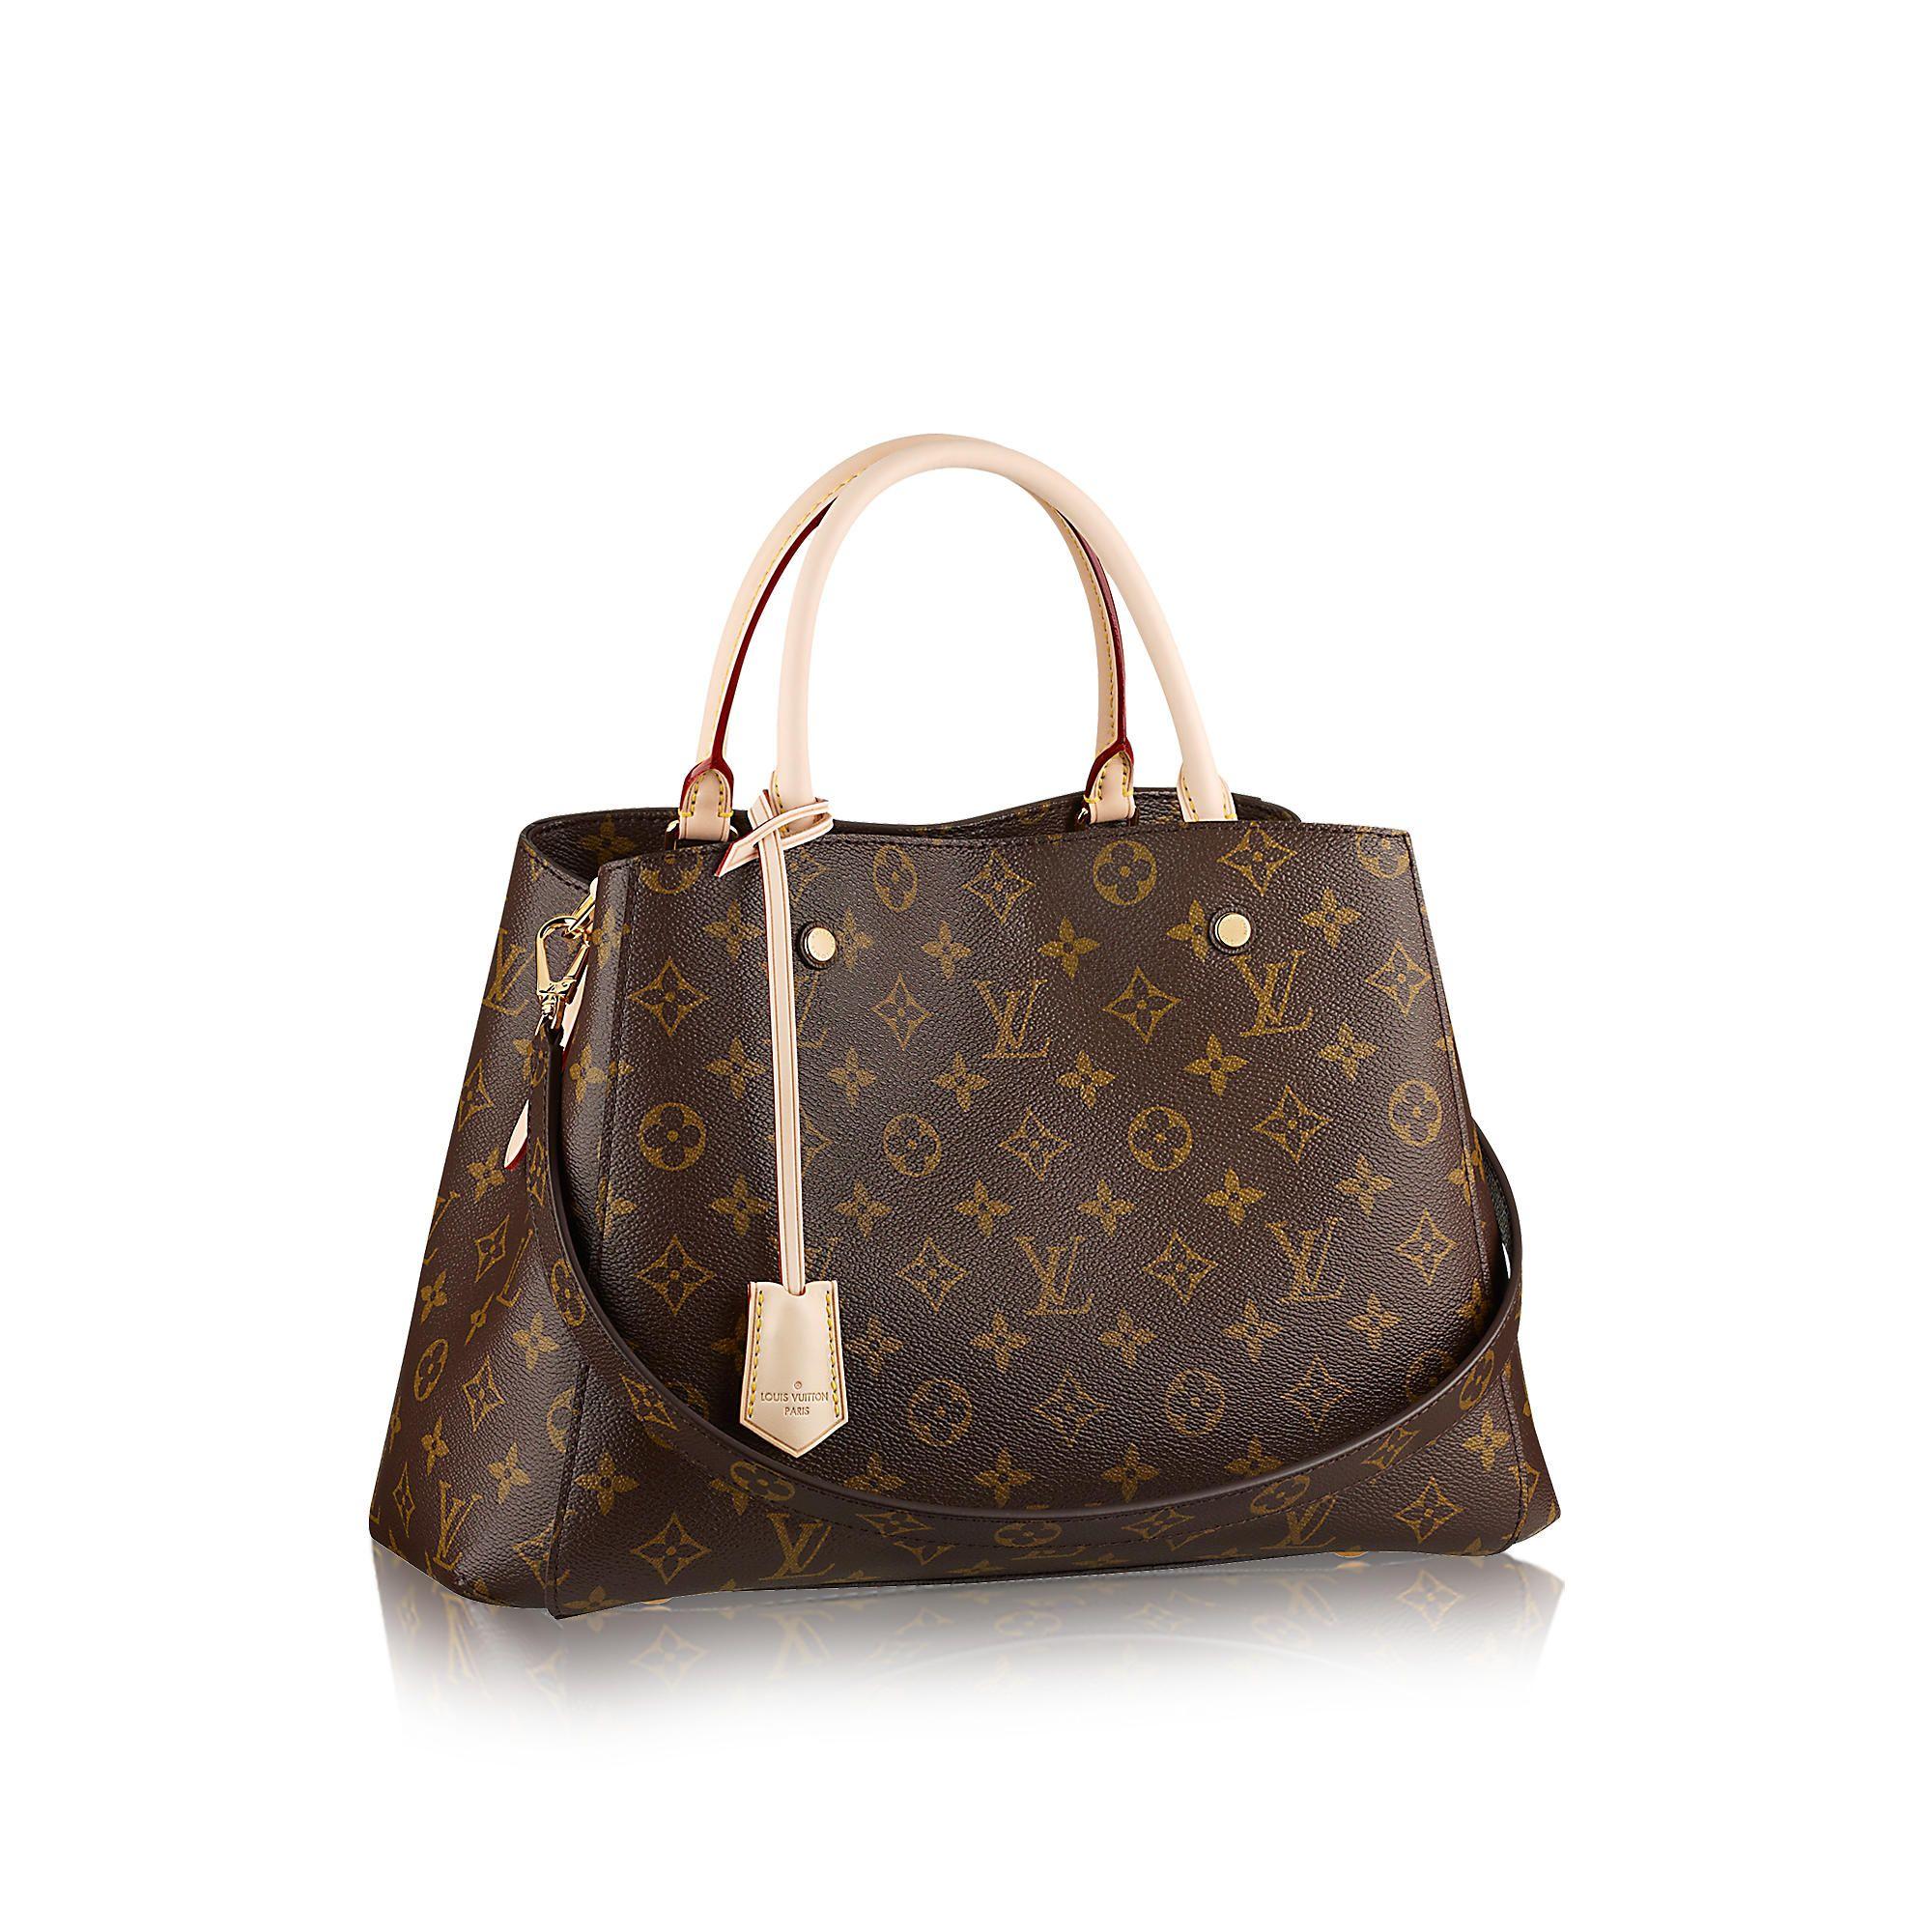 7aa13b0aa Discover Louis Vuitton Montaigne MM via Louis Vuitton | purse ...